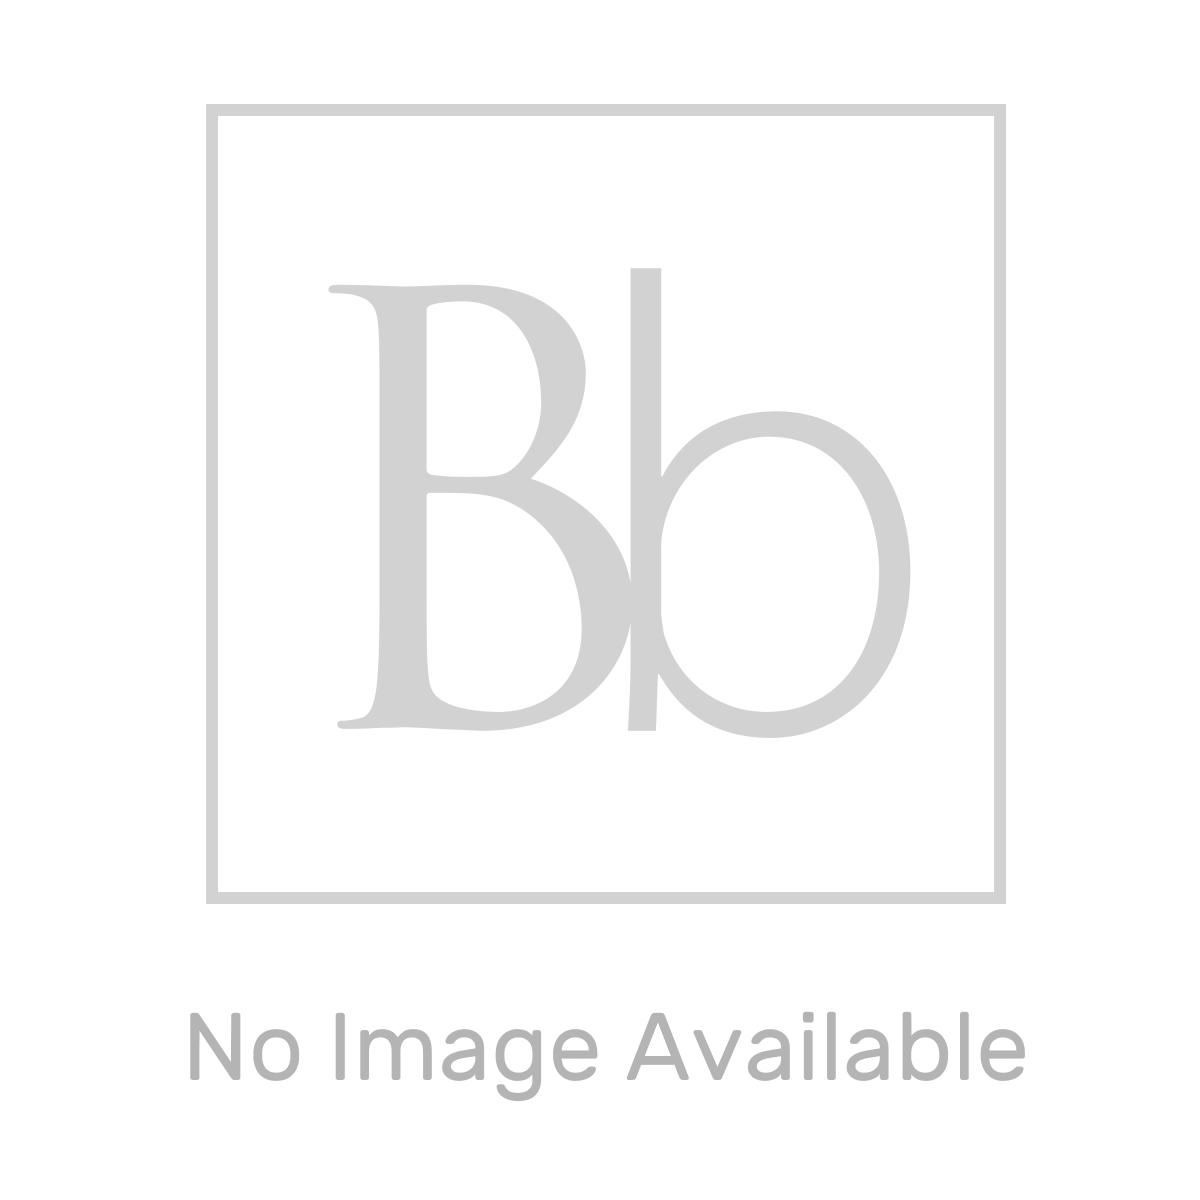 Anti-Slip Shower Tray 900mm x 900mm Line Drawing